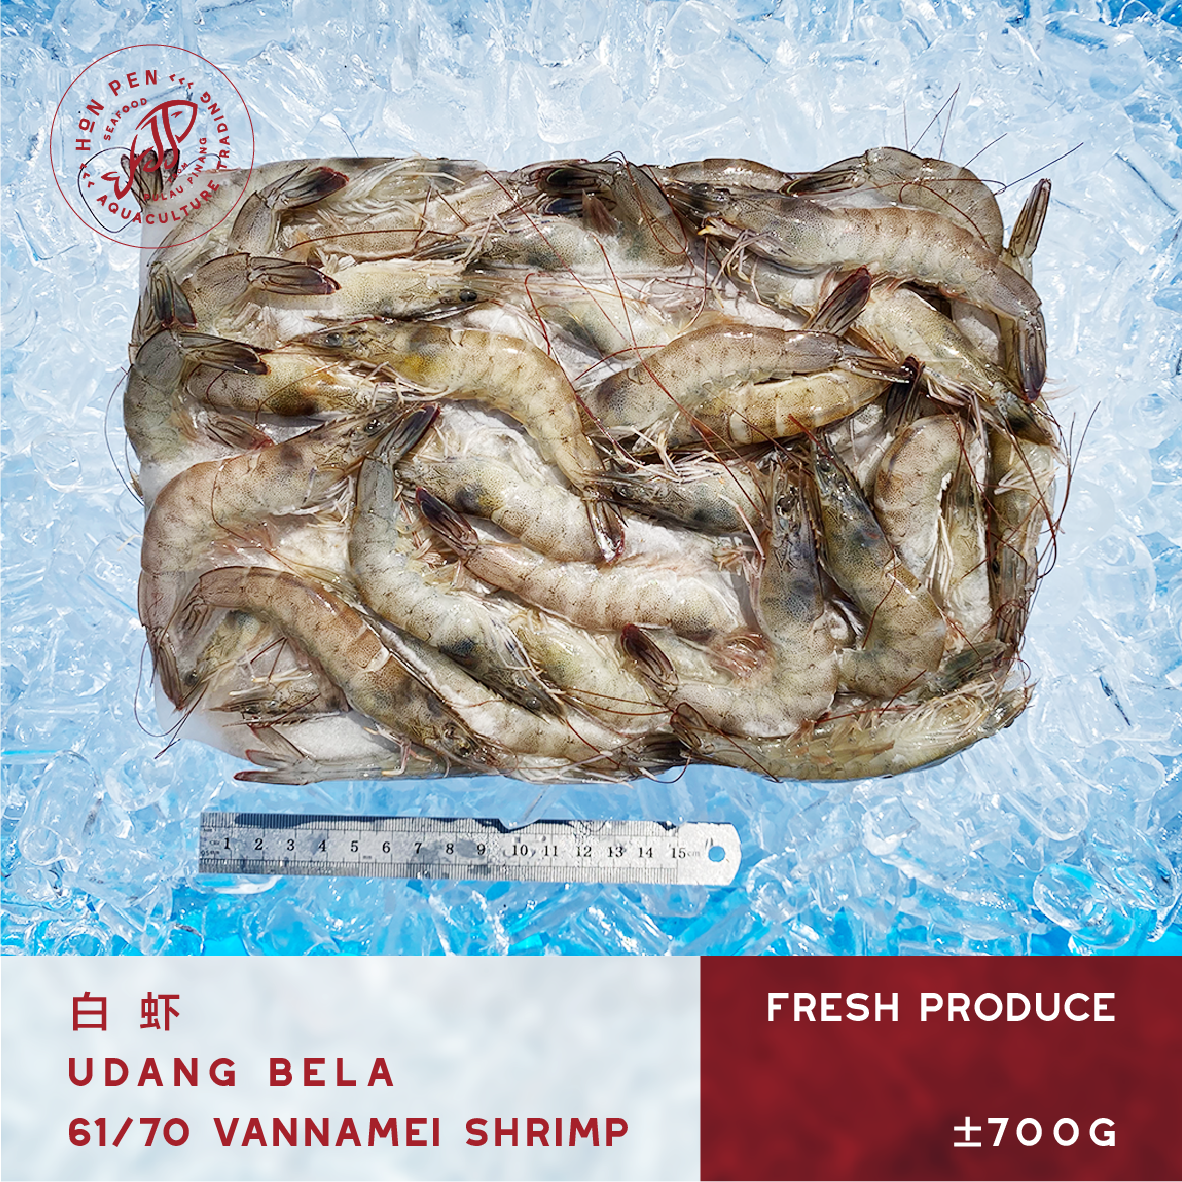 VANNAMEI SHRIMP 61/70 白虾 UDANG BELA (Seafood) ±700g